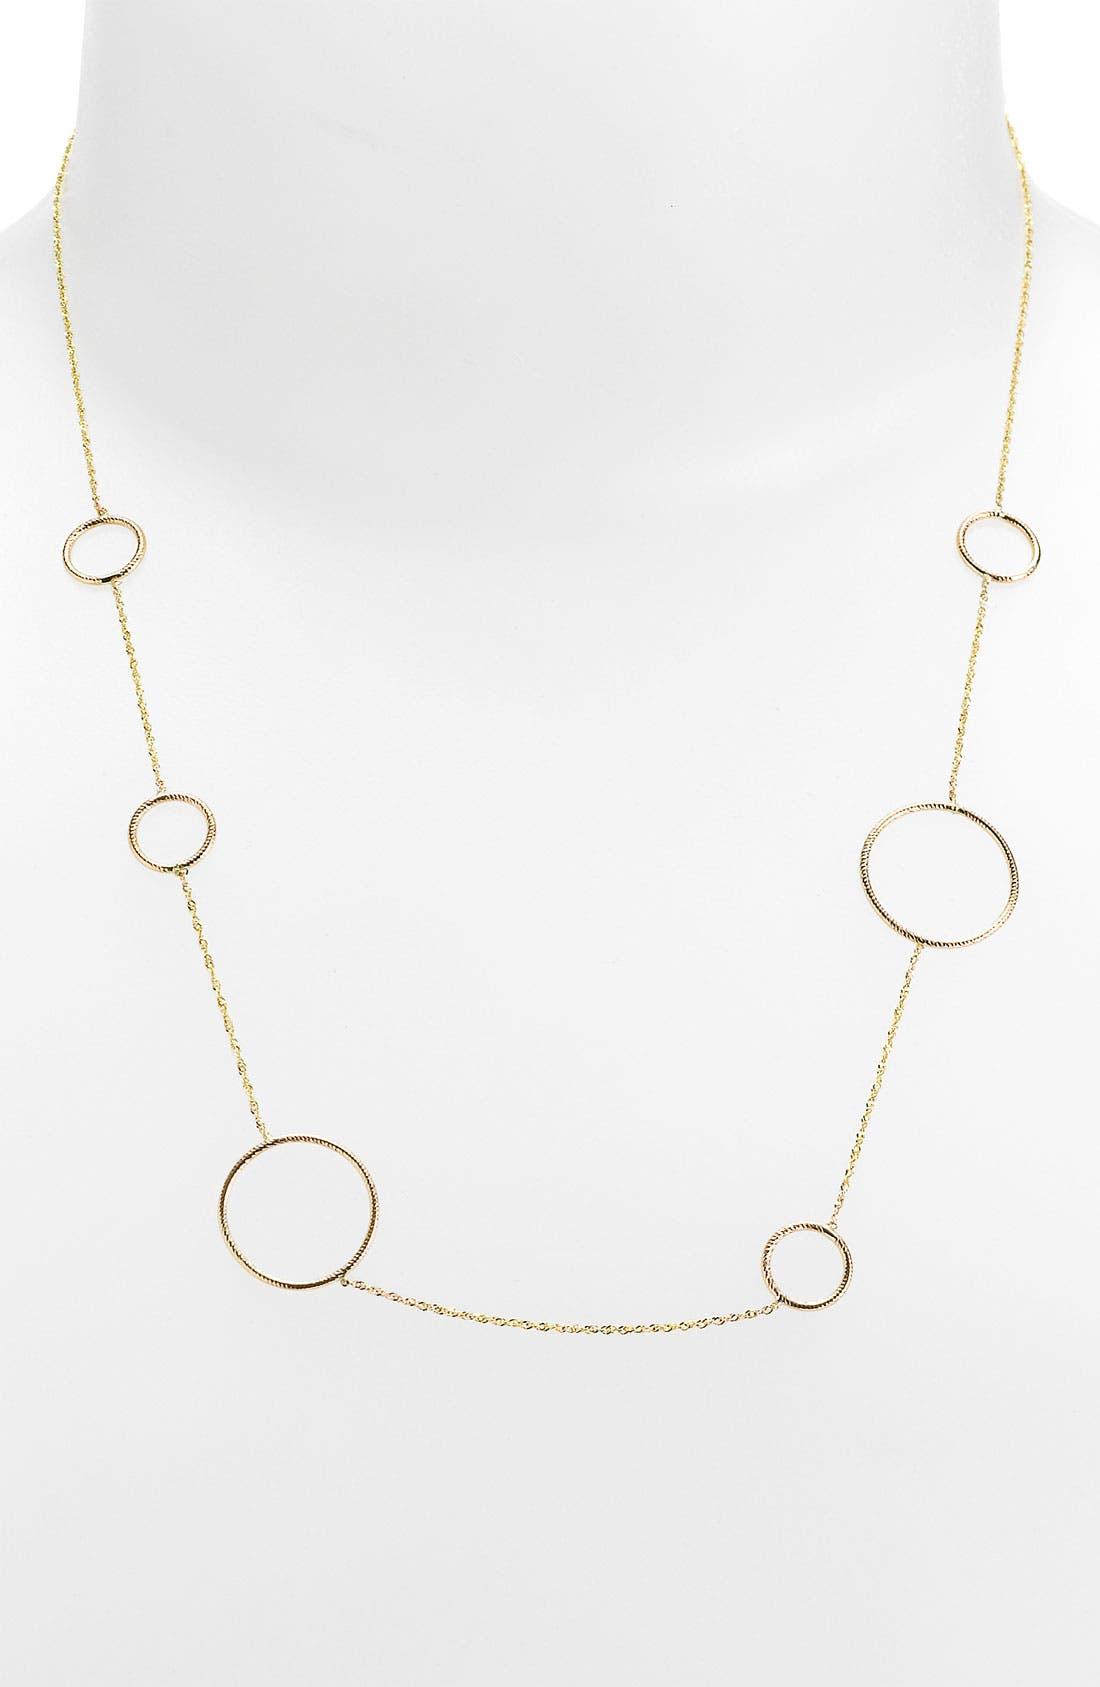 Main Image - Lana Jewelry 'Short Adoring' Necklace